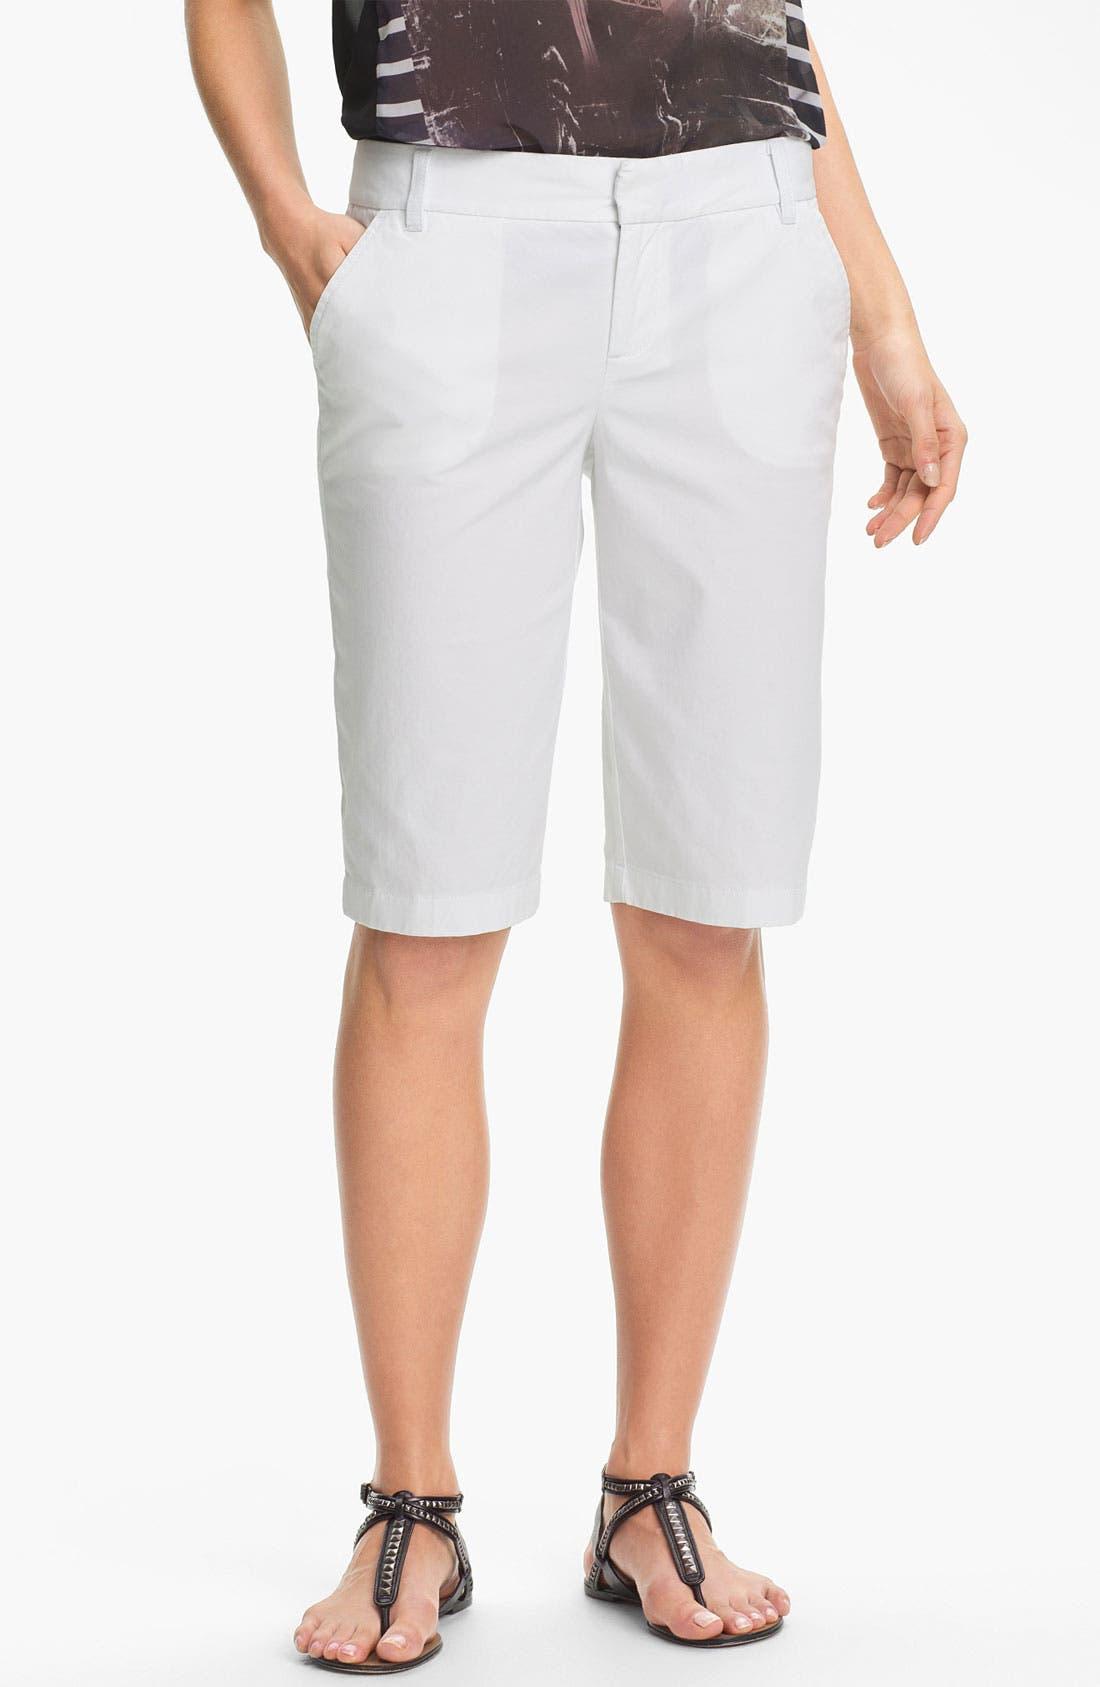 Alternate Image 1 Selected - Caslon® Twill Bermuda Shorts (Petite)